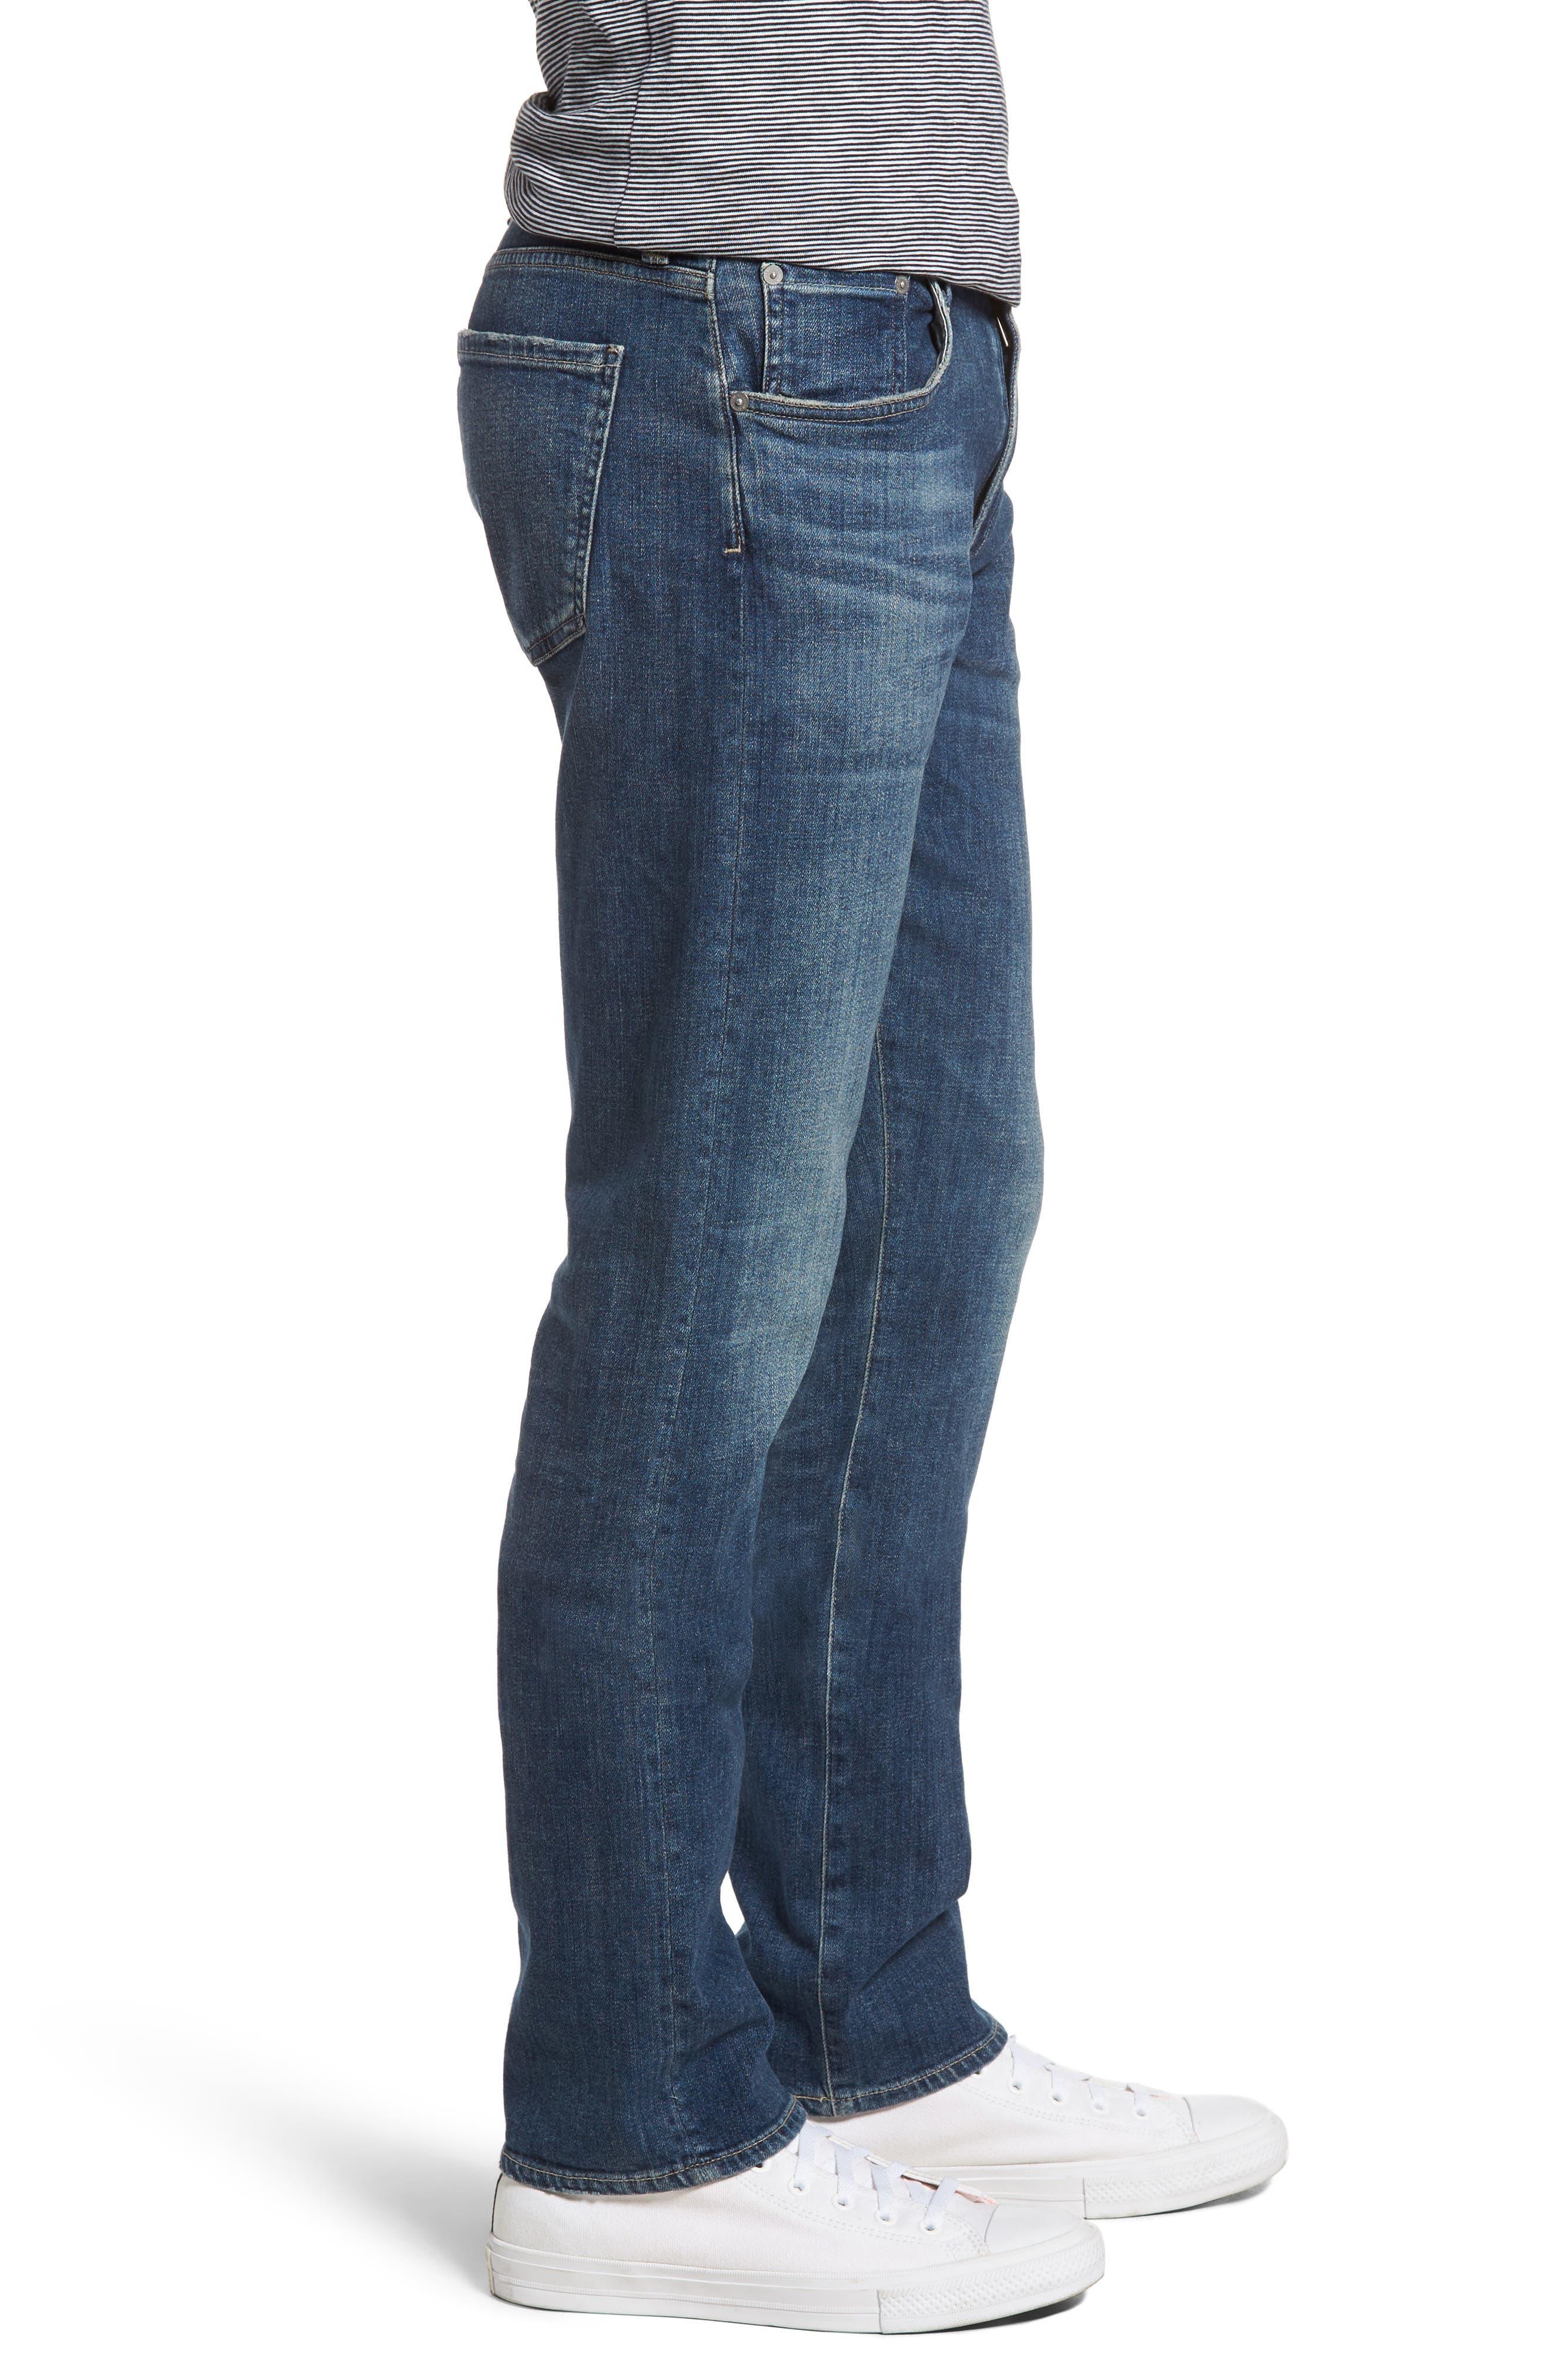 Gage Slim Straight Leg Jeans,                             Alternate thumbnail 3, color,                             REDFORD